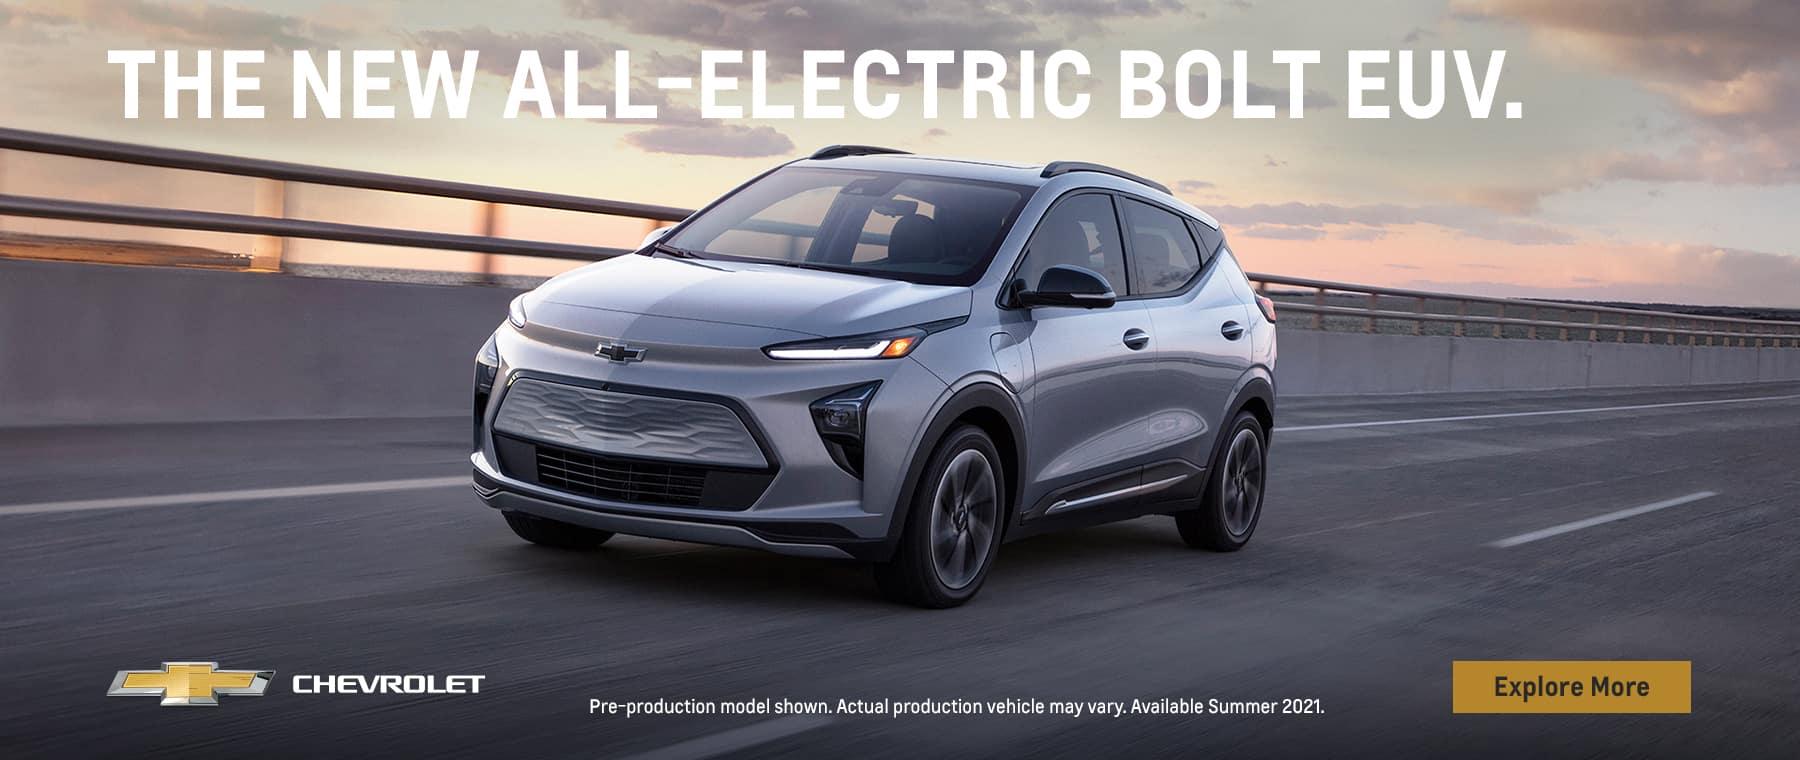 Silver 2021 Chevrolet Bolt EV